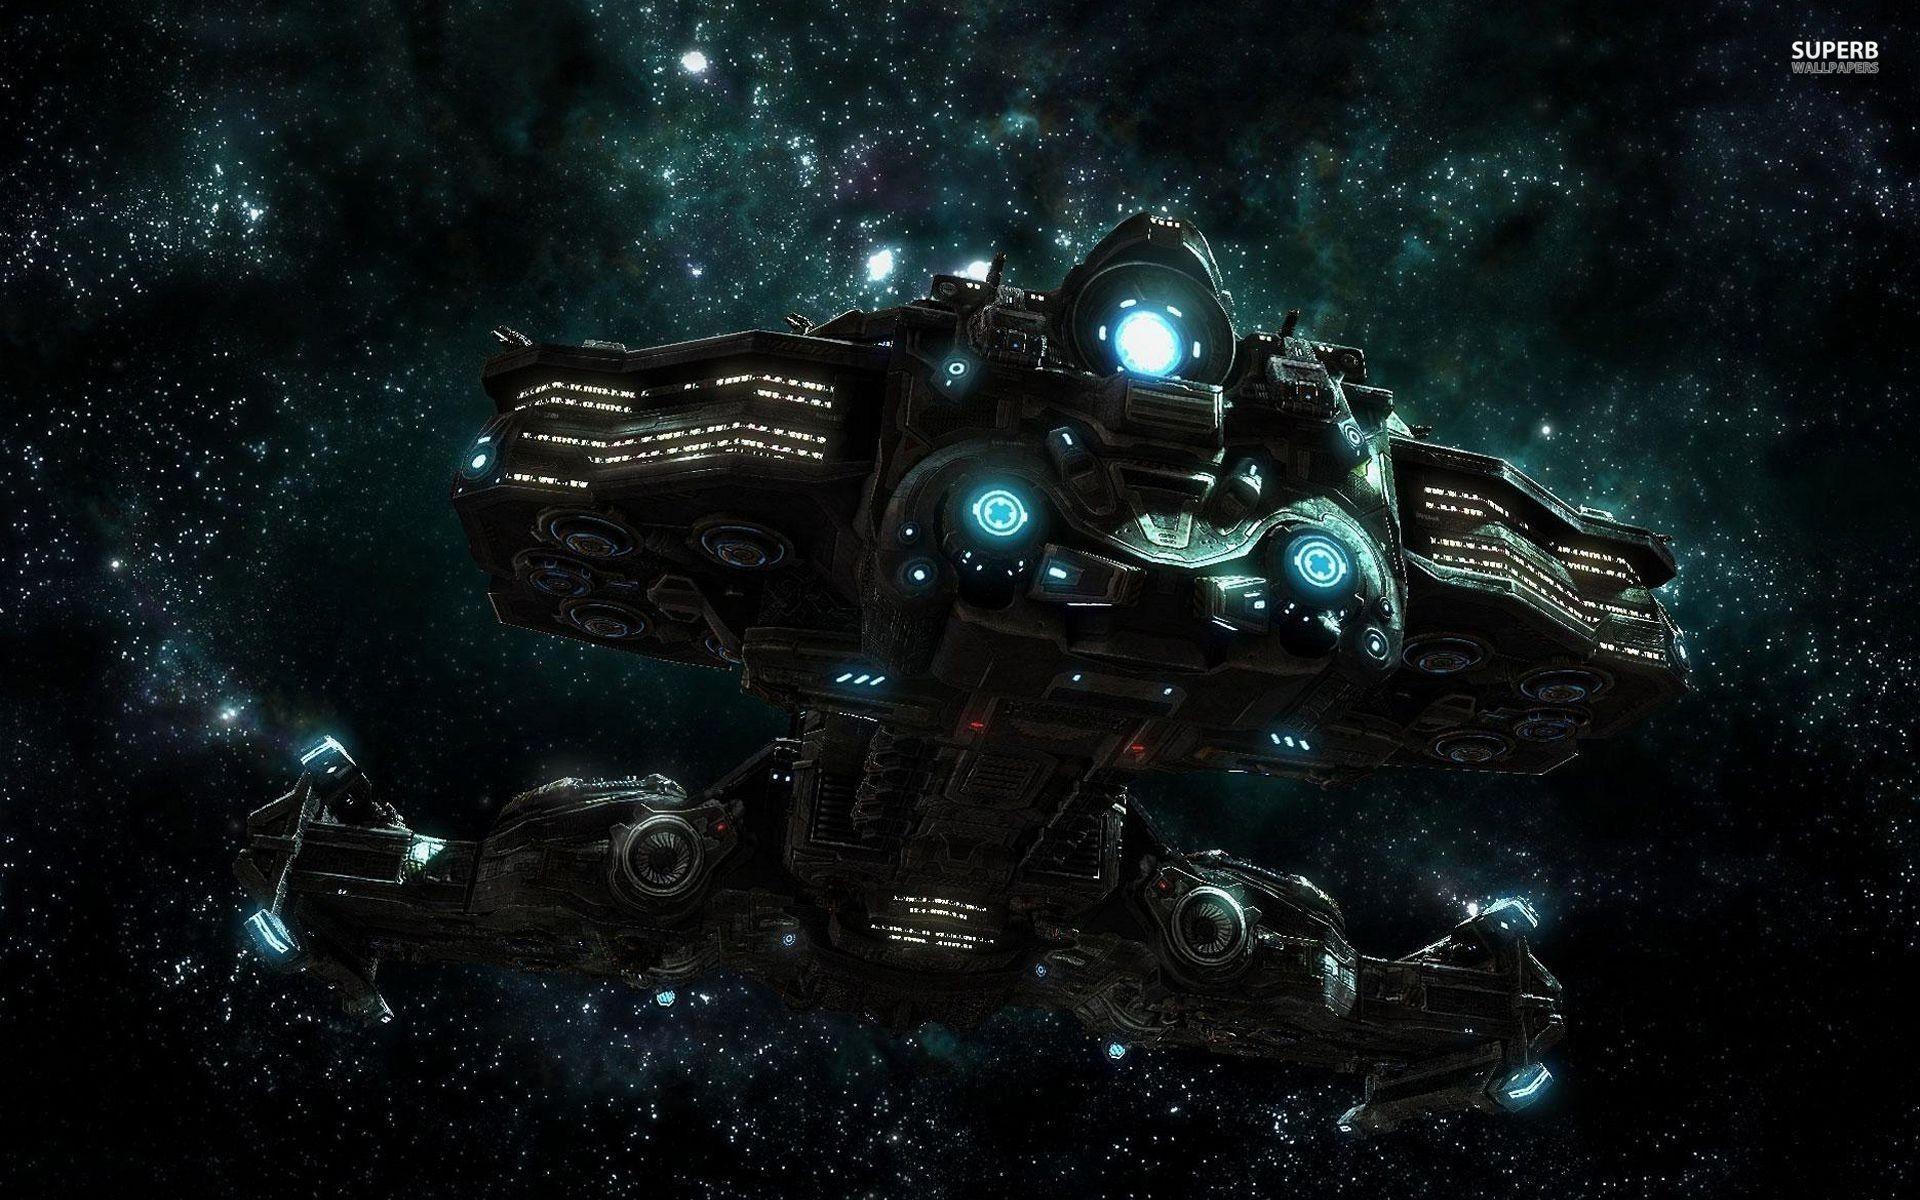 Starcraft Wallpapers 3840x2160